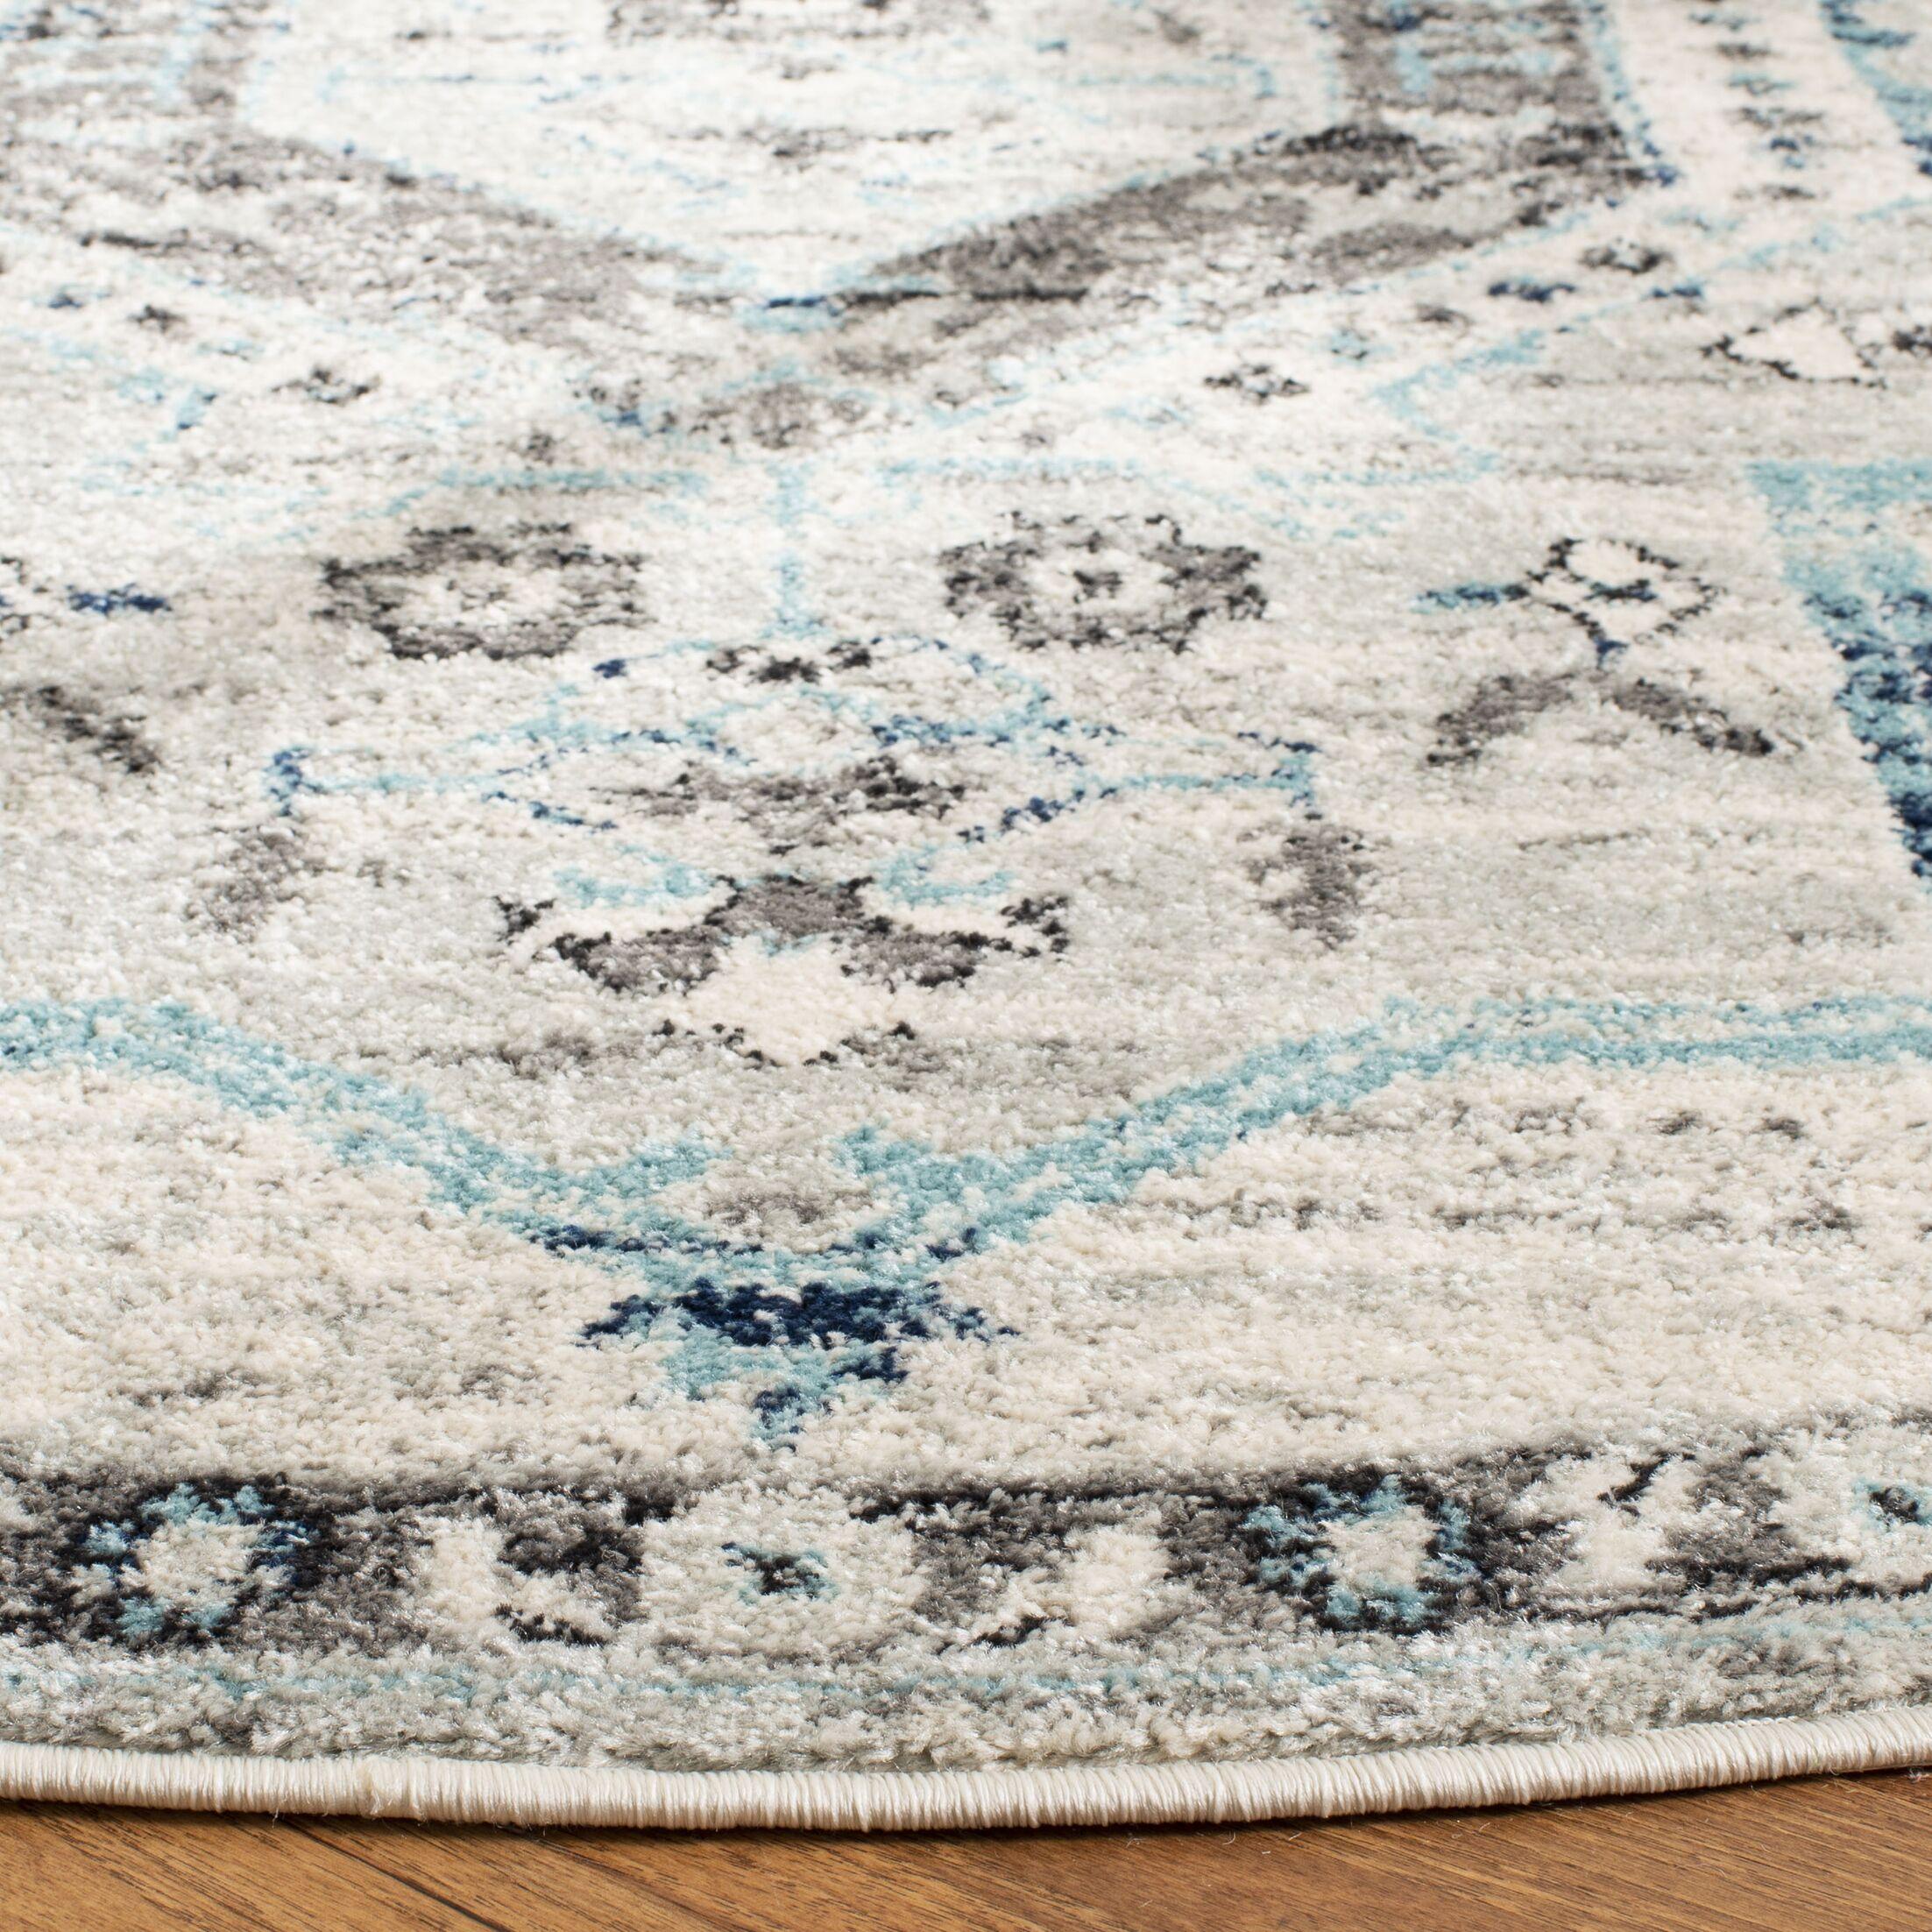 Kauffman Gray/Blue Area Rug Rug Size: Square 6'7